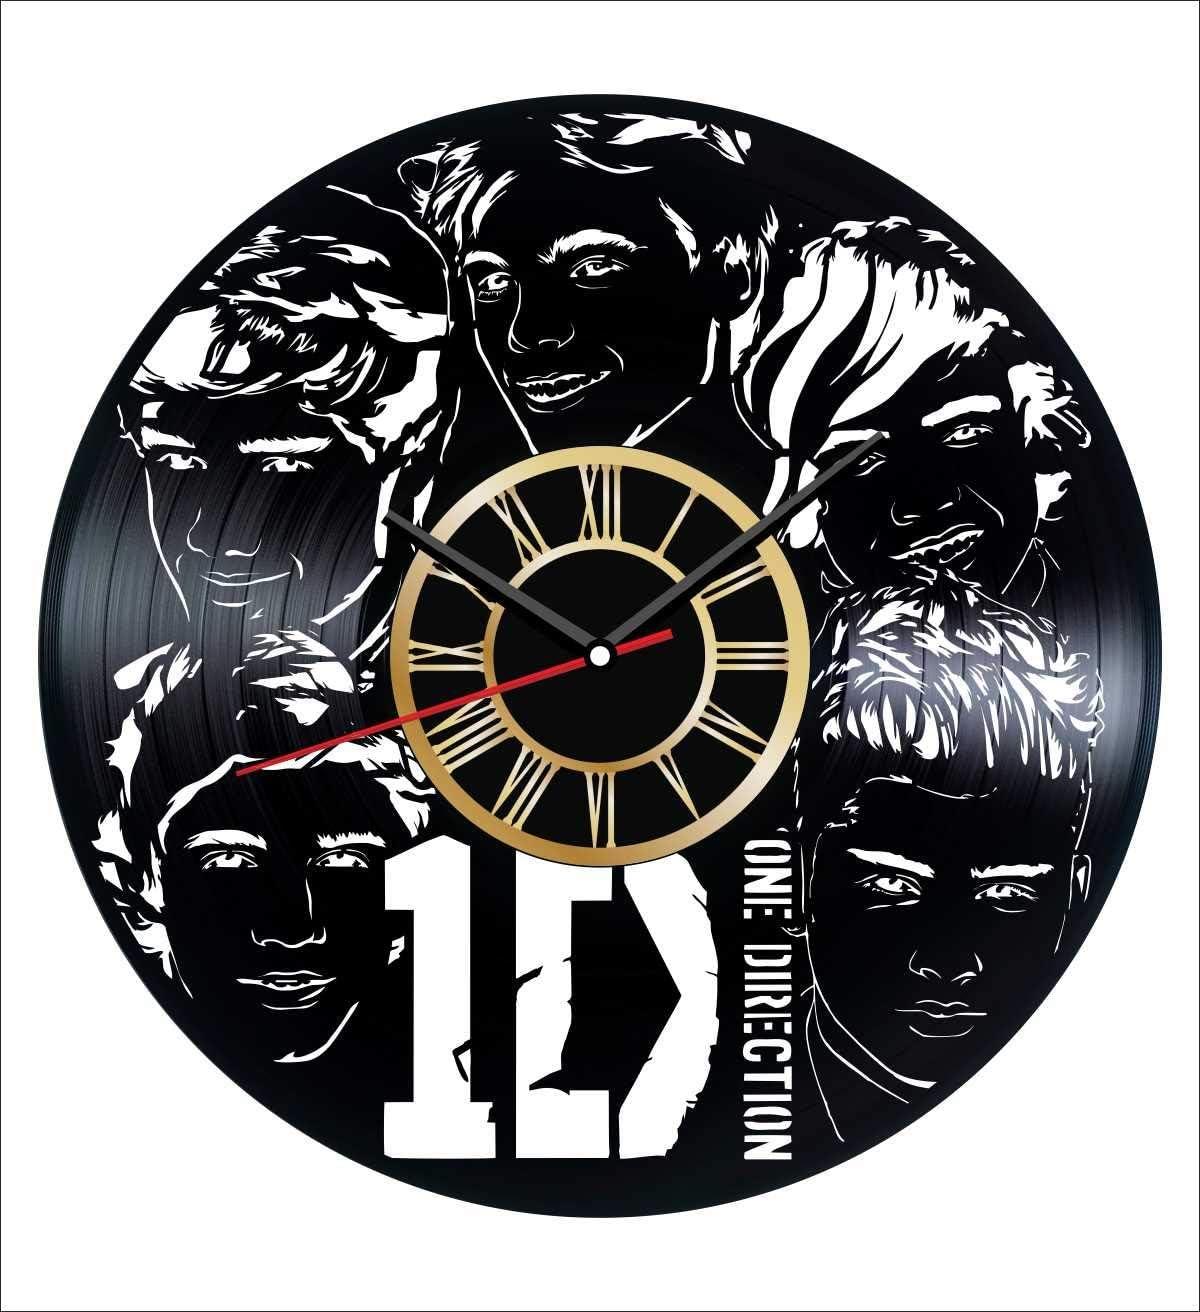 One Direction Vinyl ☆国内最安値に挑戦☆ Wall Clock Vintage Unique Get スーパーセール期間限定 Record Home -